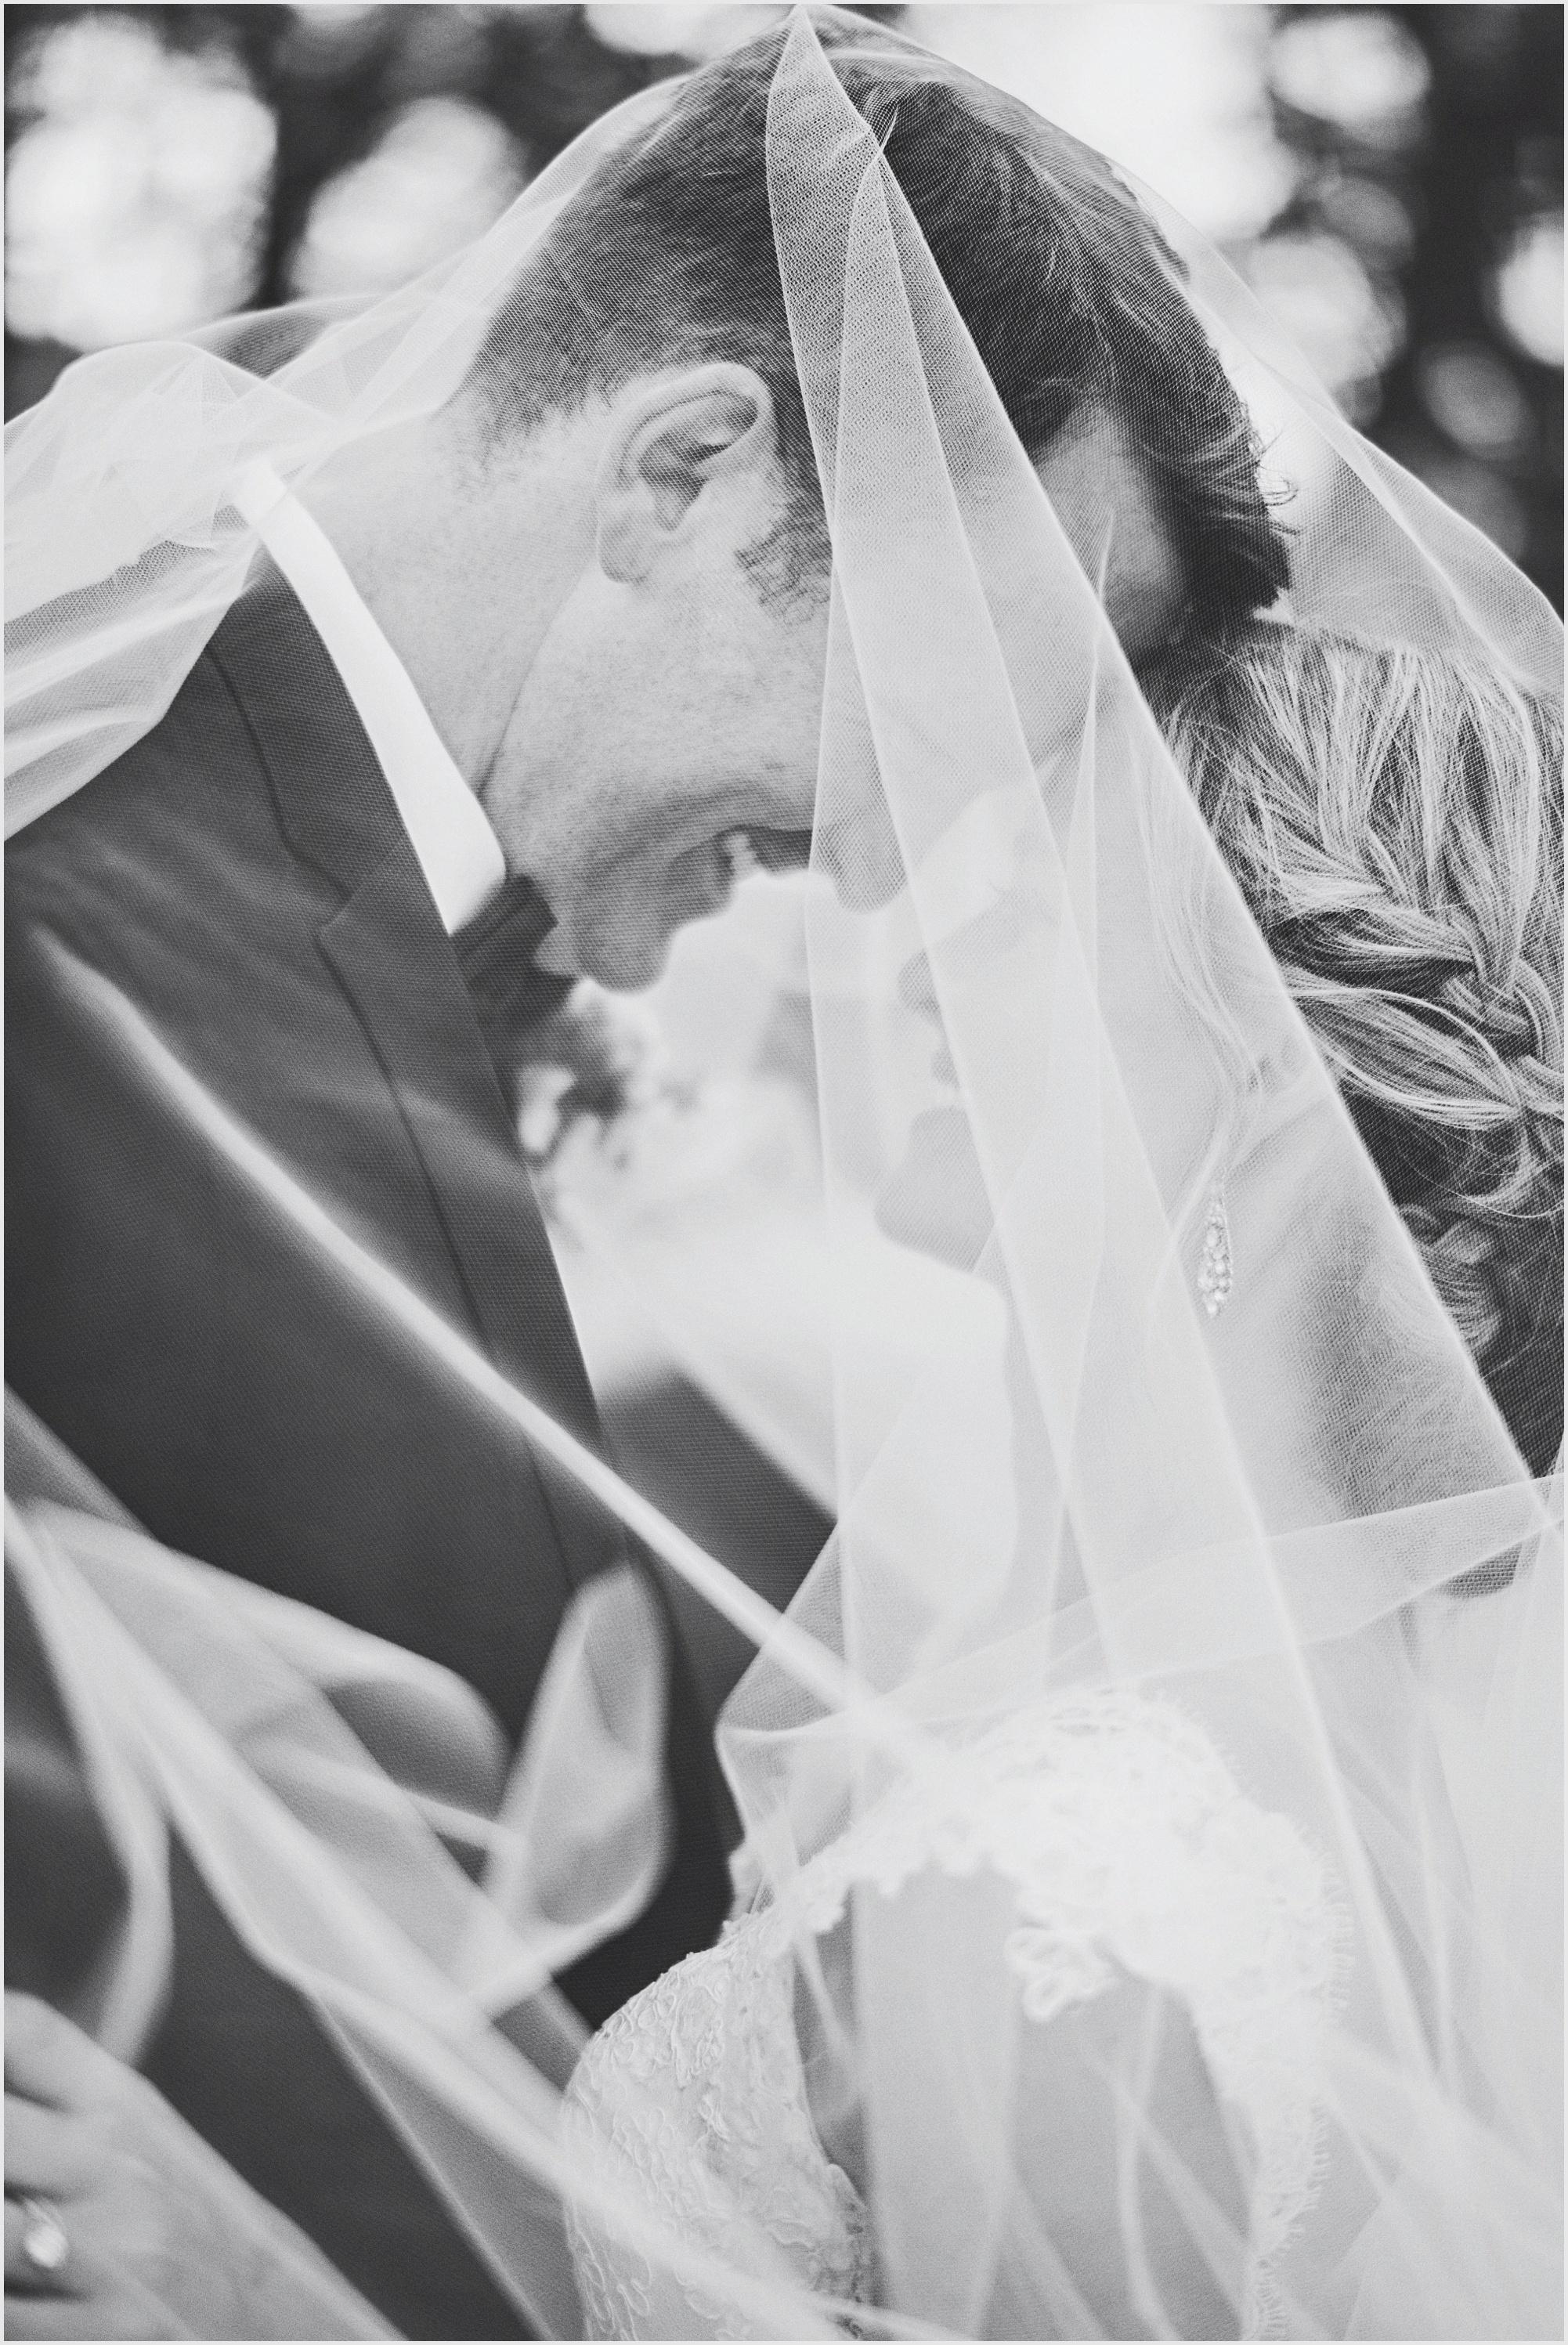 maura_david_james_j_hill_wedding_lucas_botz_photography_028.jpg